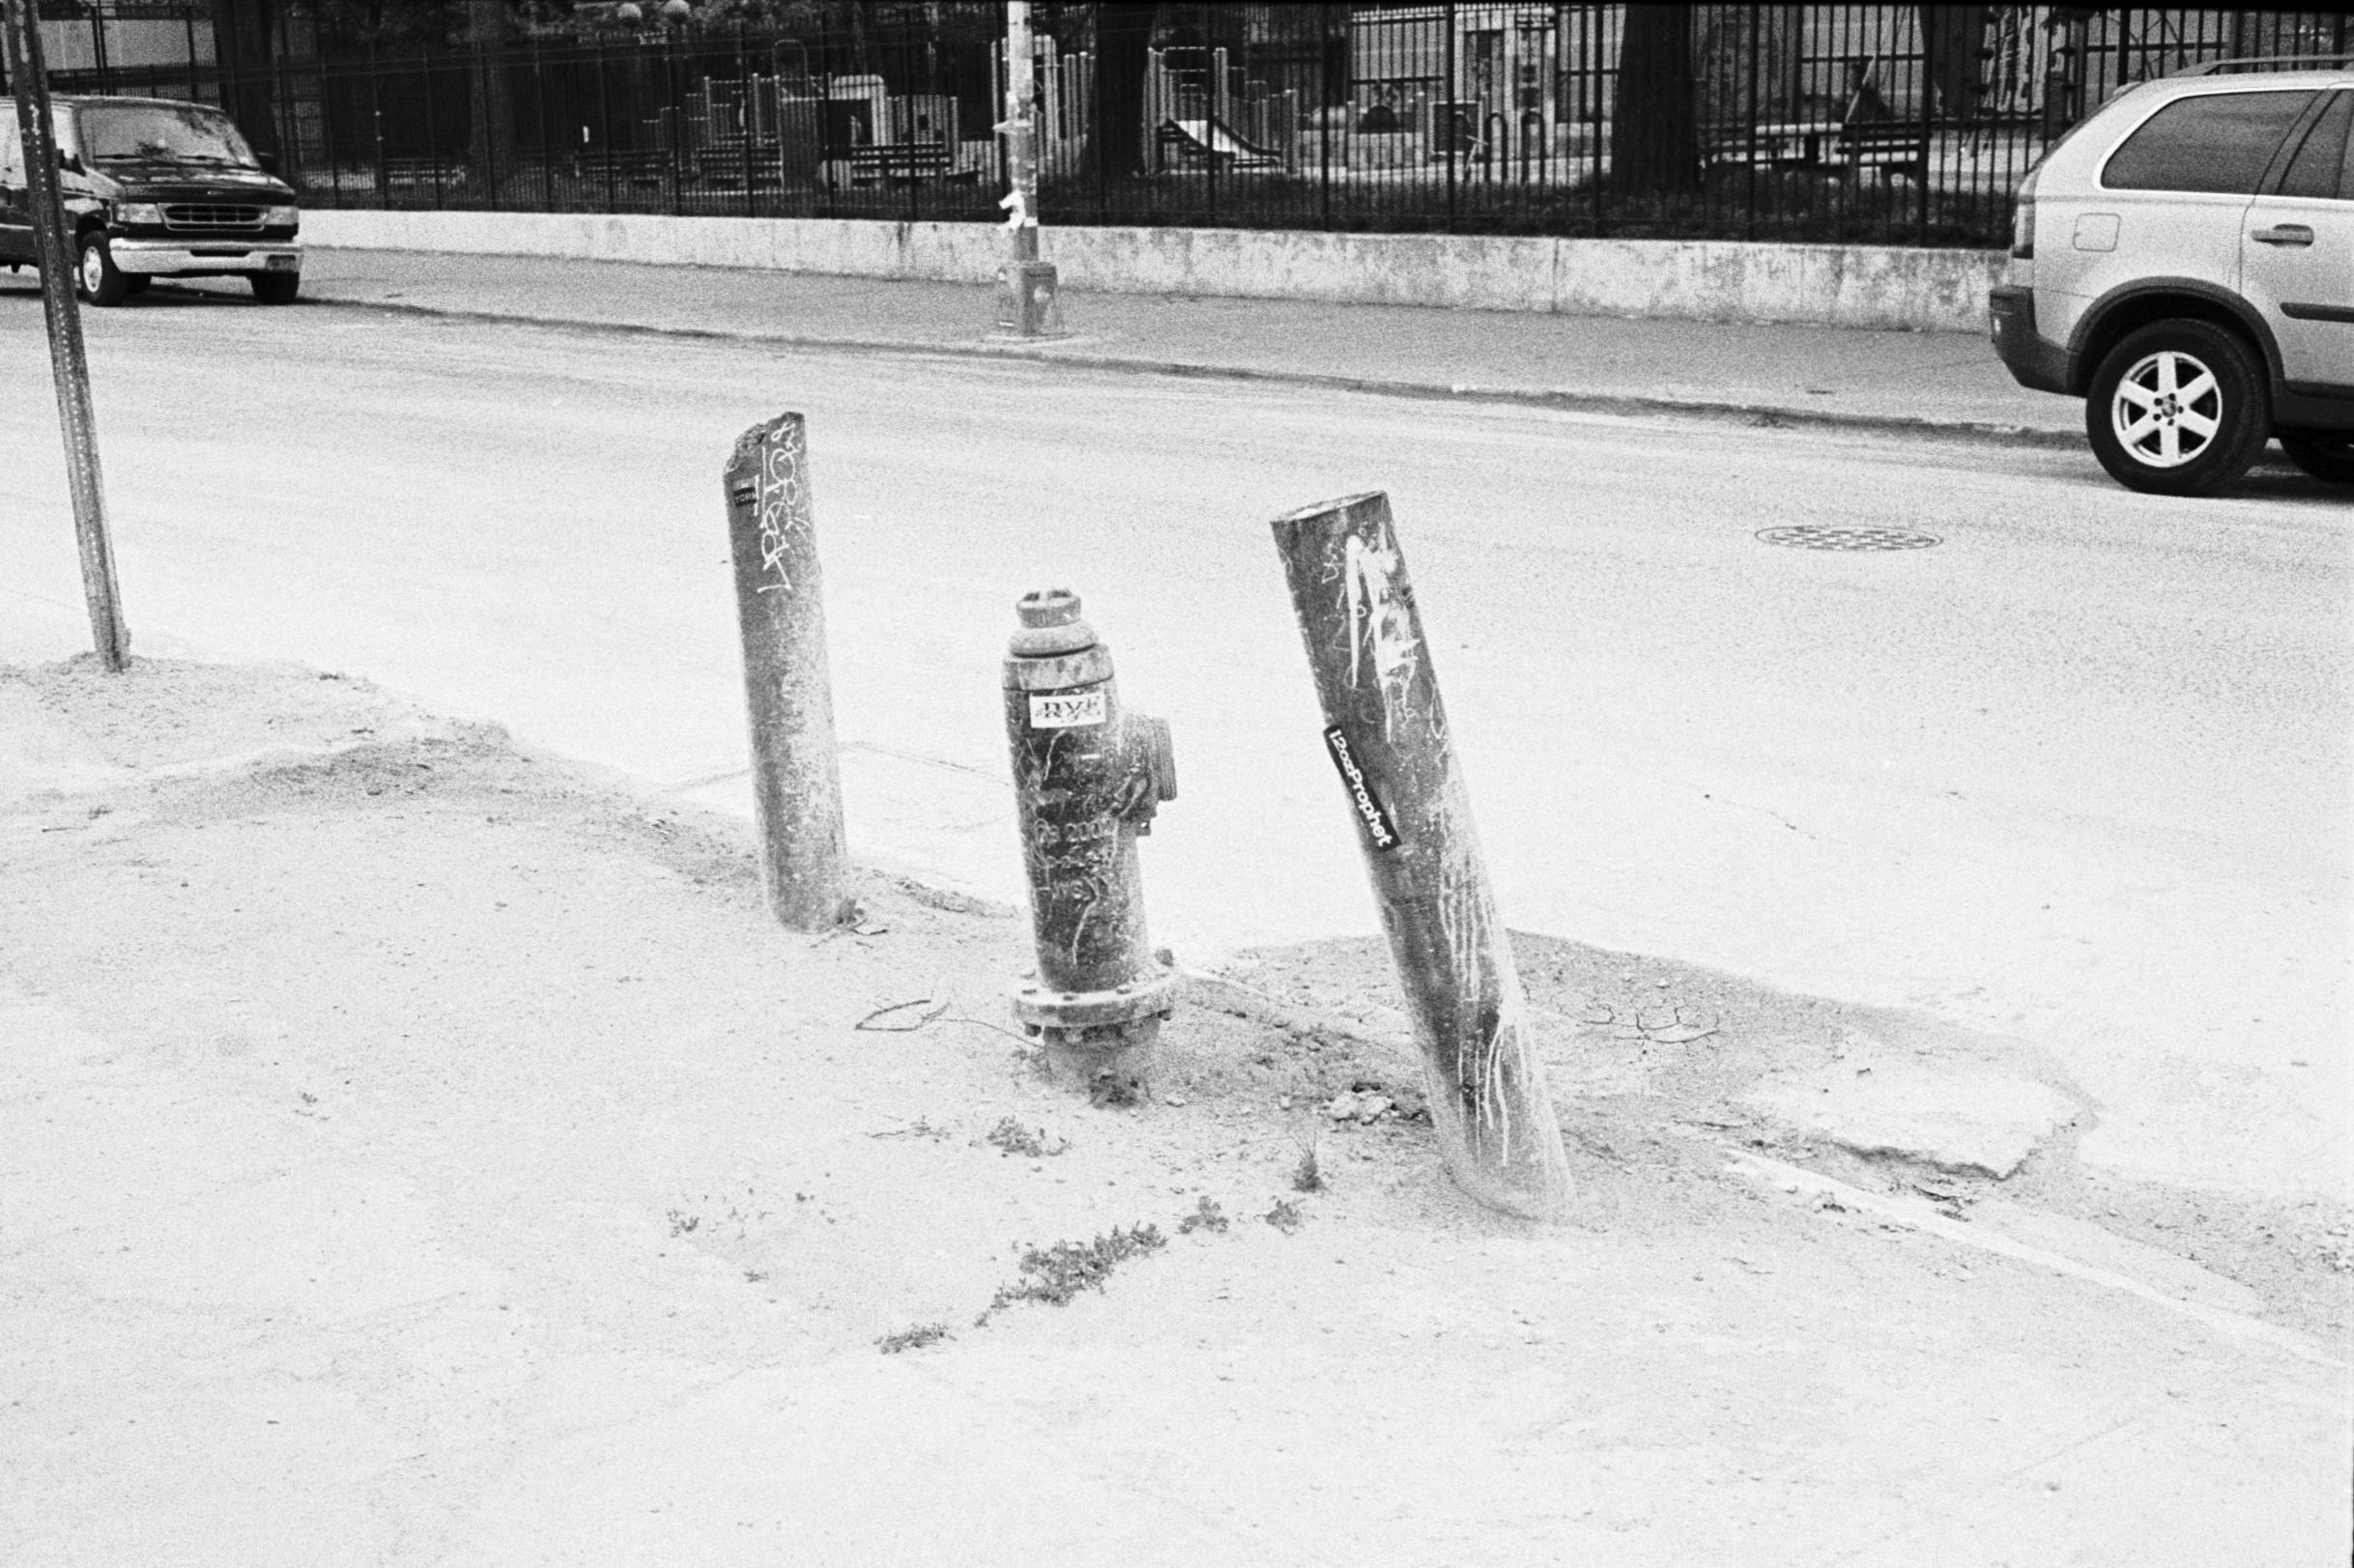 Hydrant black on white copy.jpg